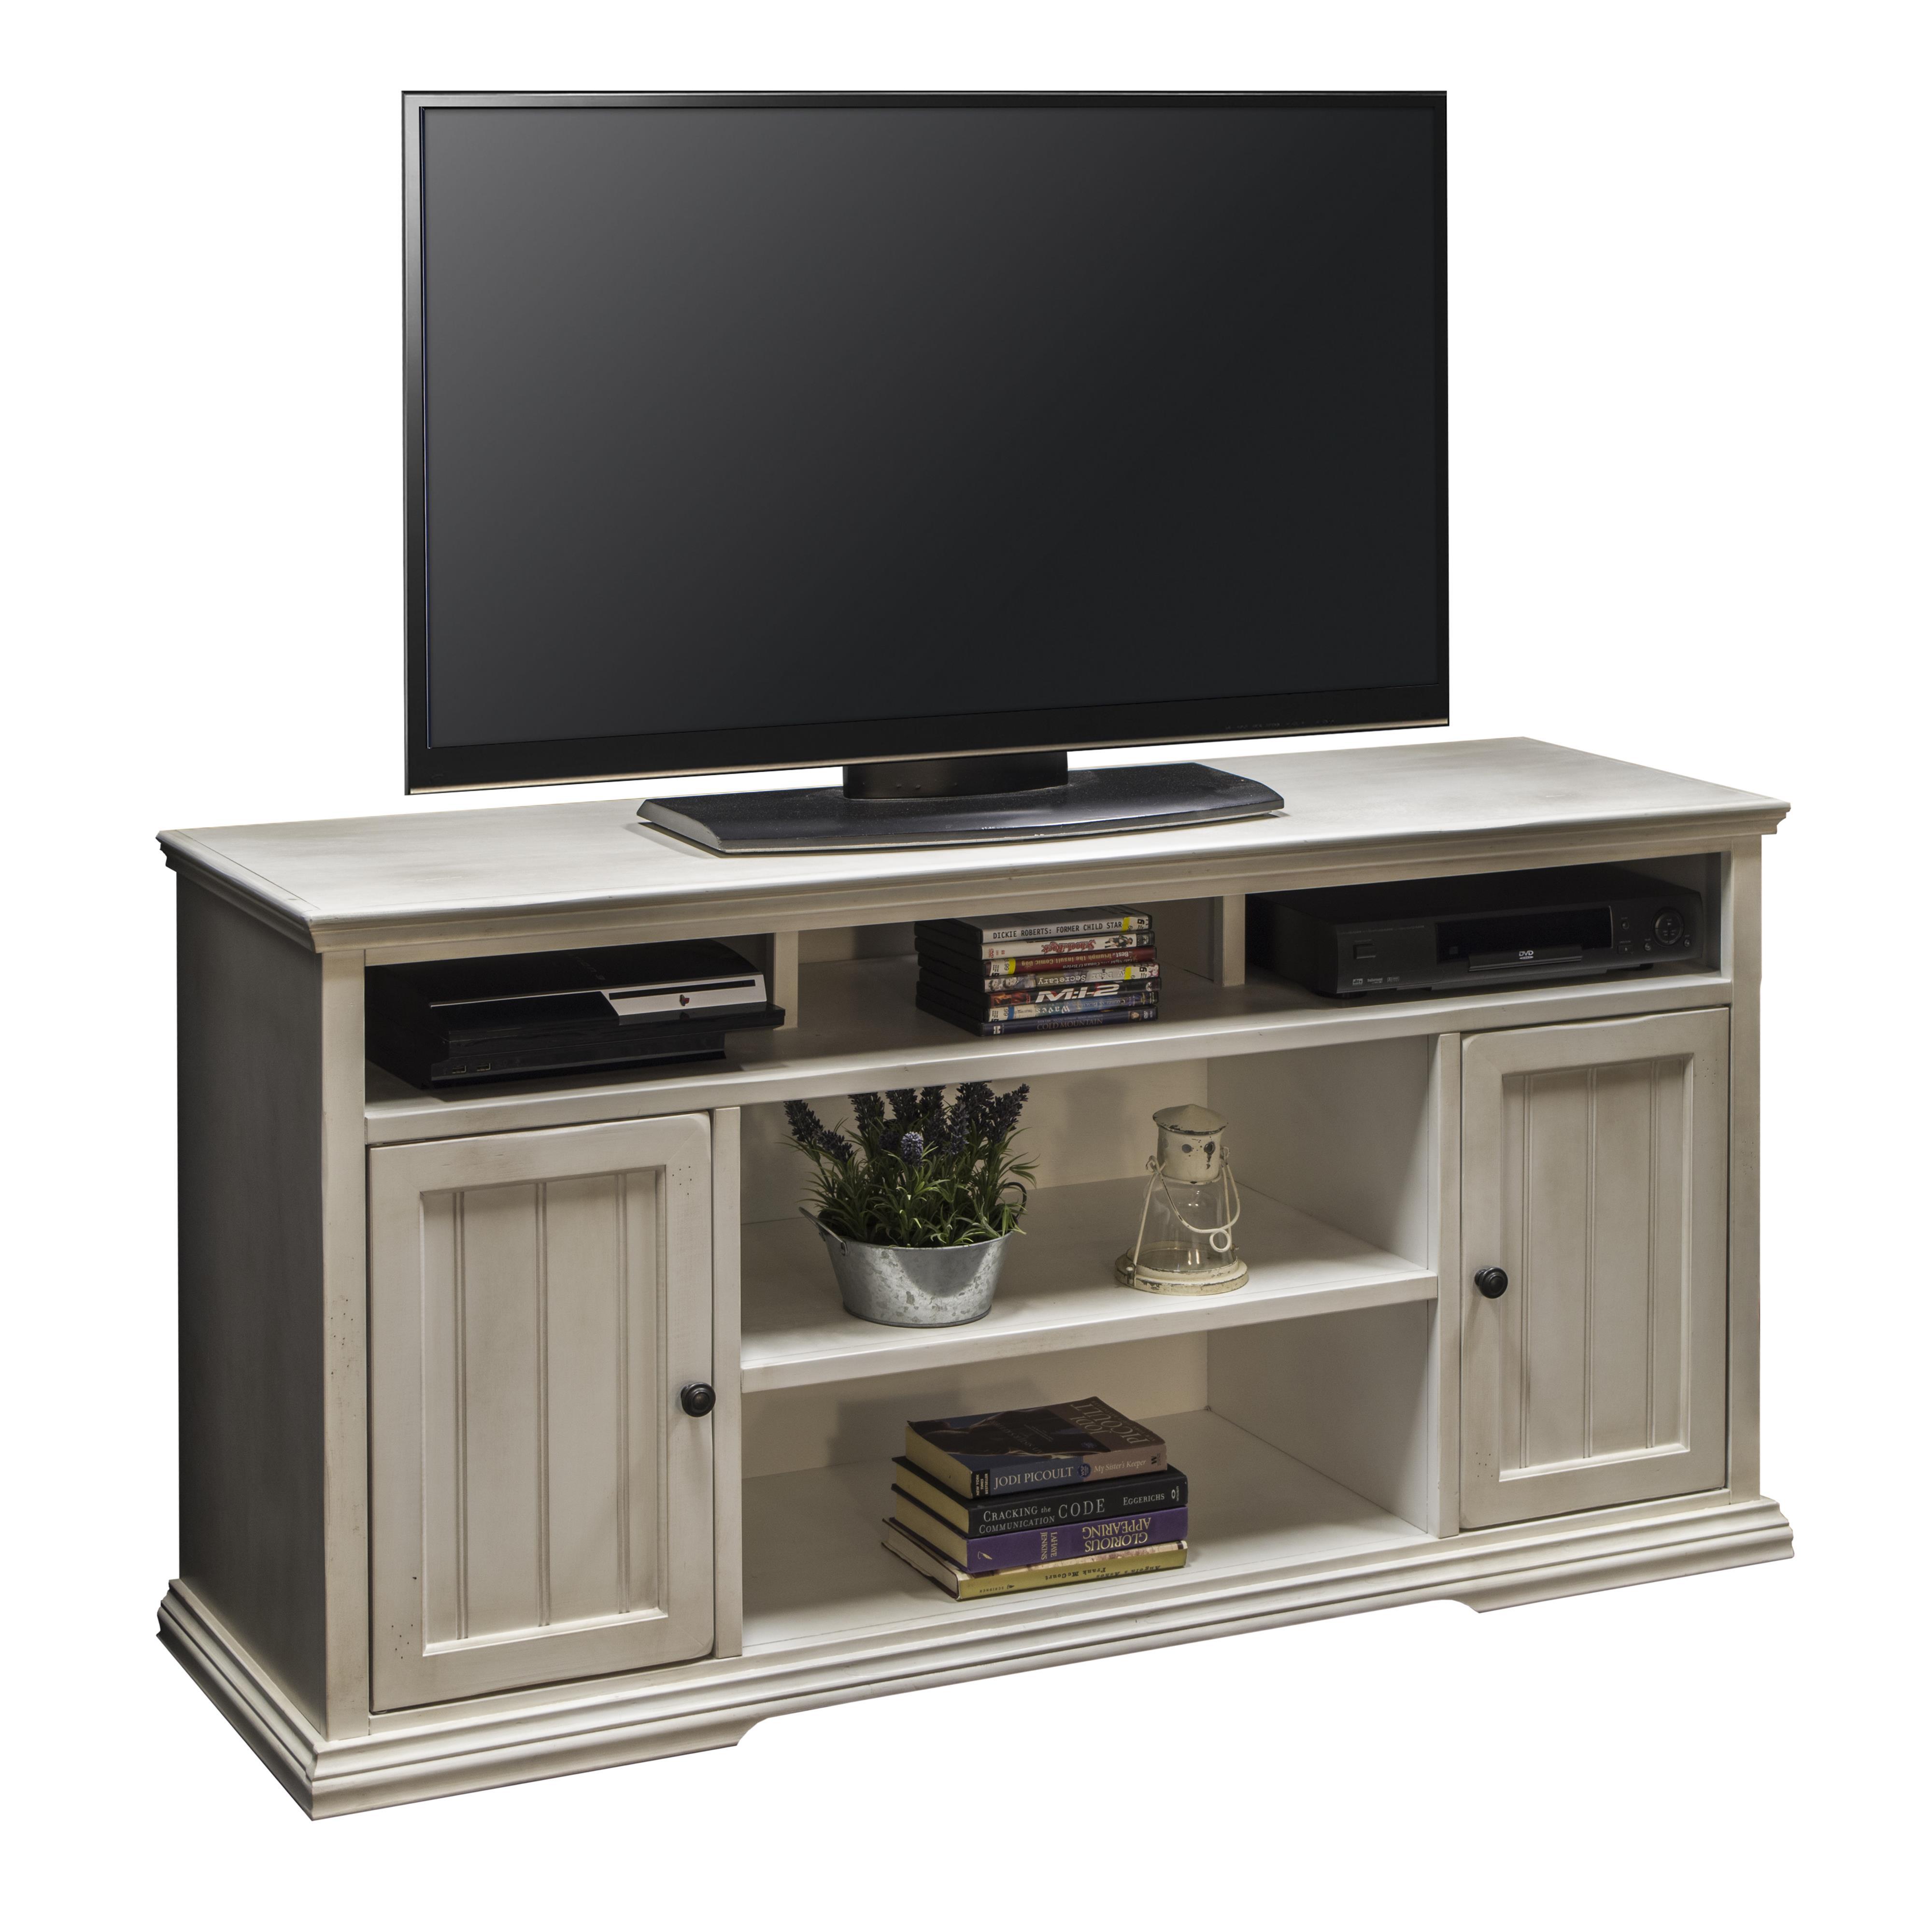 "Legends Furniture Riverton 62"" Tall TV Cart - Item Number: RT1328-ATW"